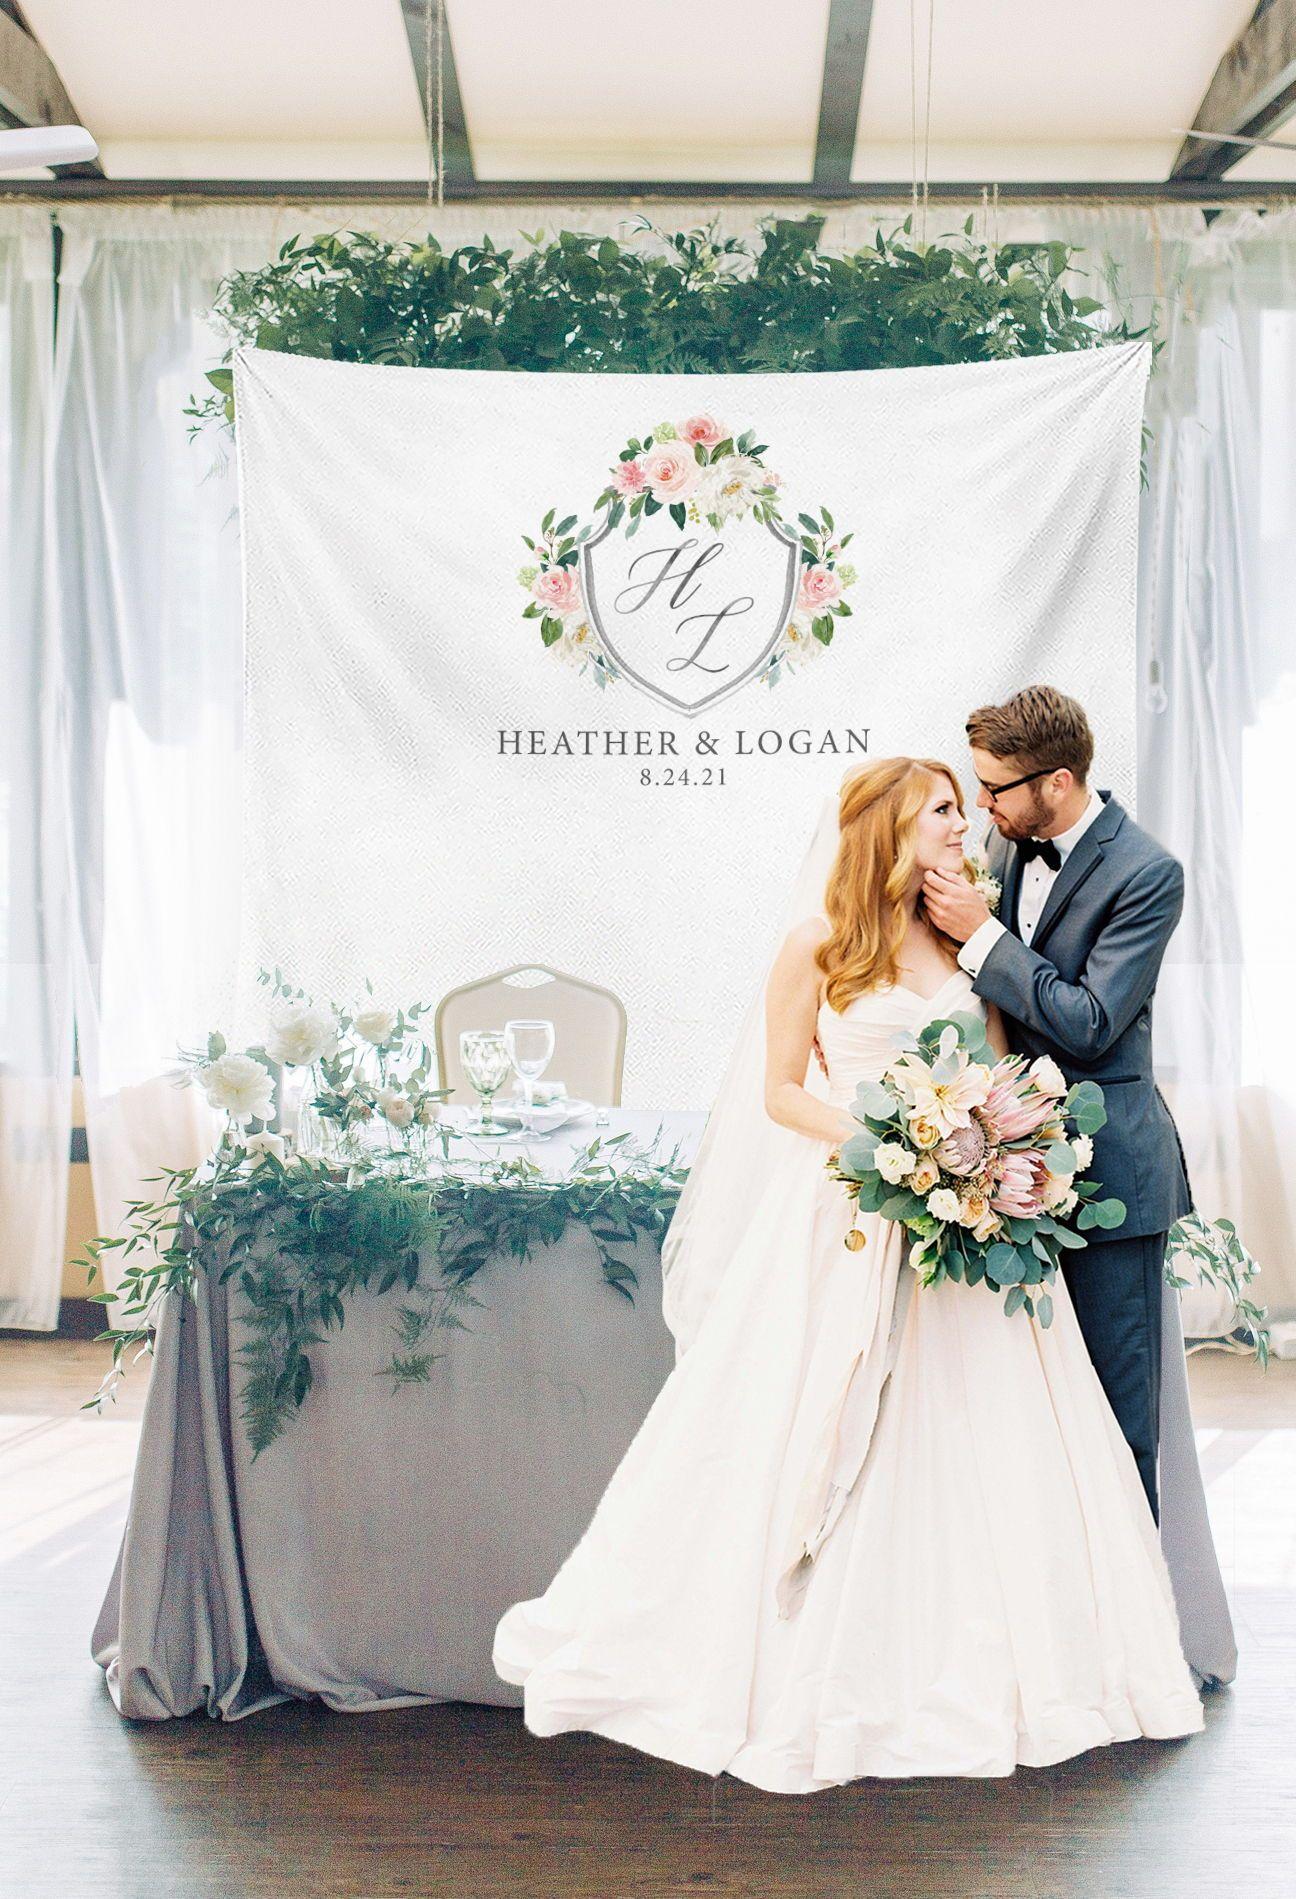 Romantic custom banner for sweetheart table. #backdropideas ...